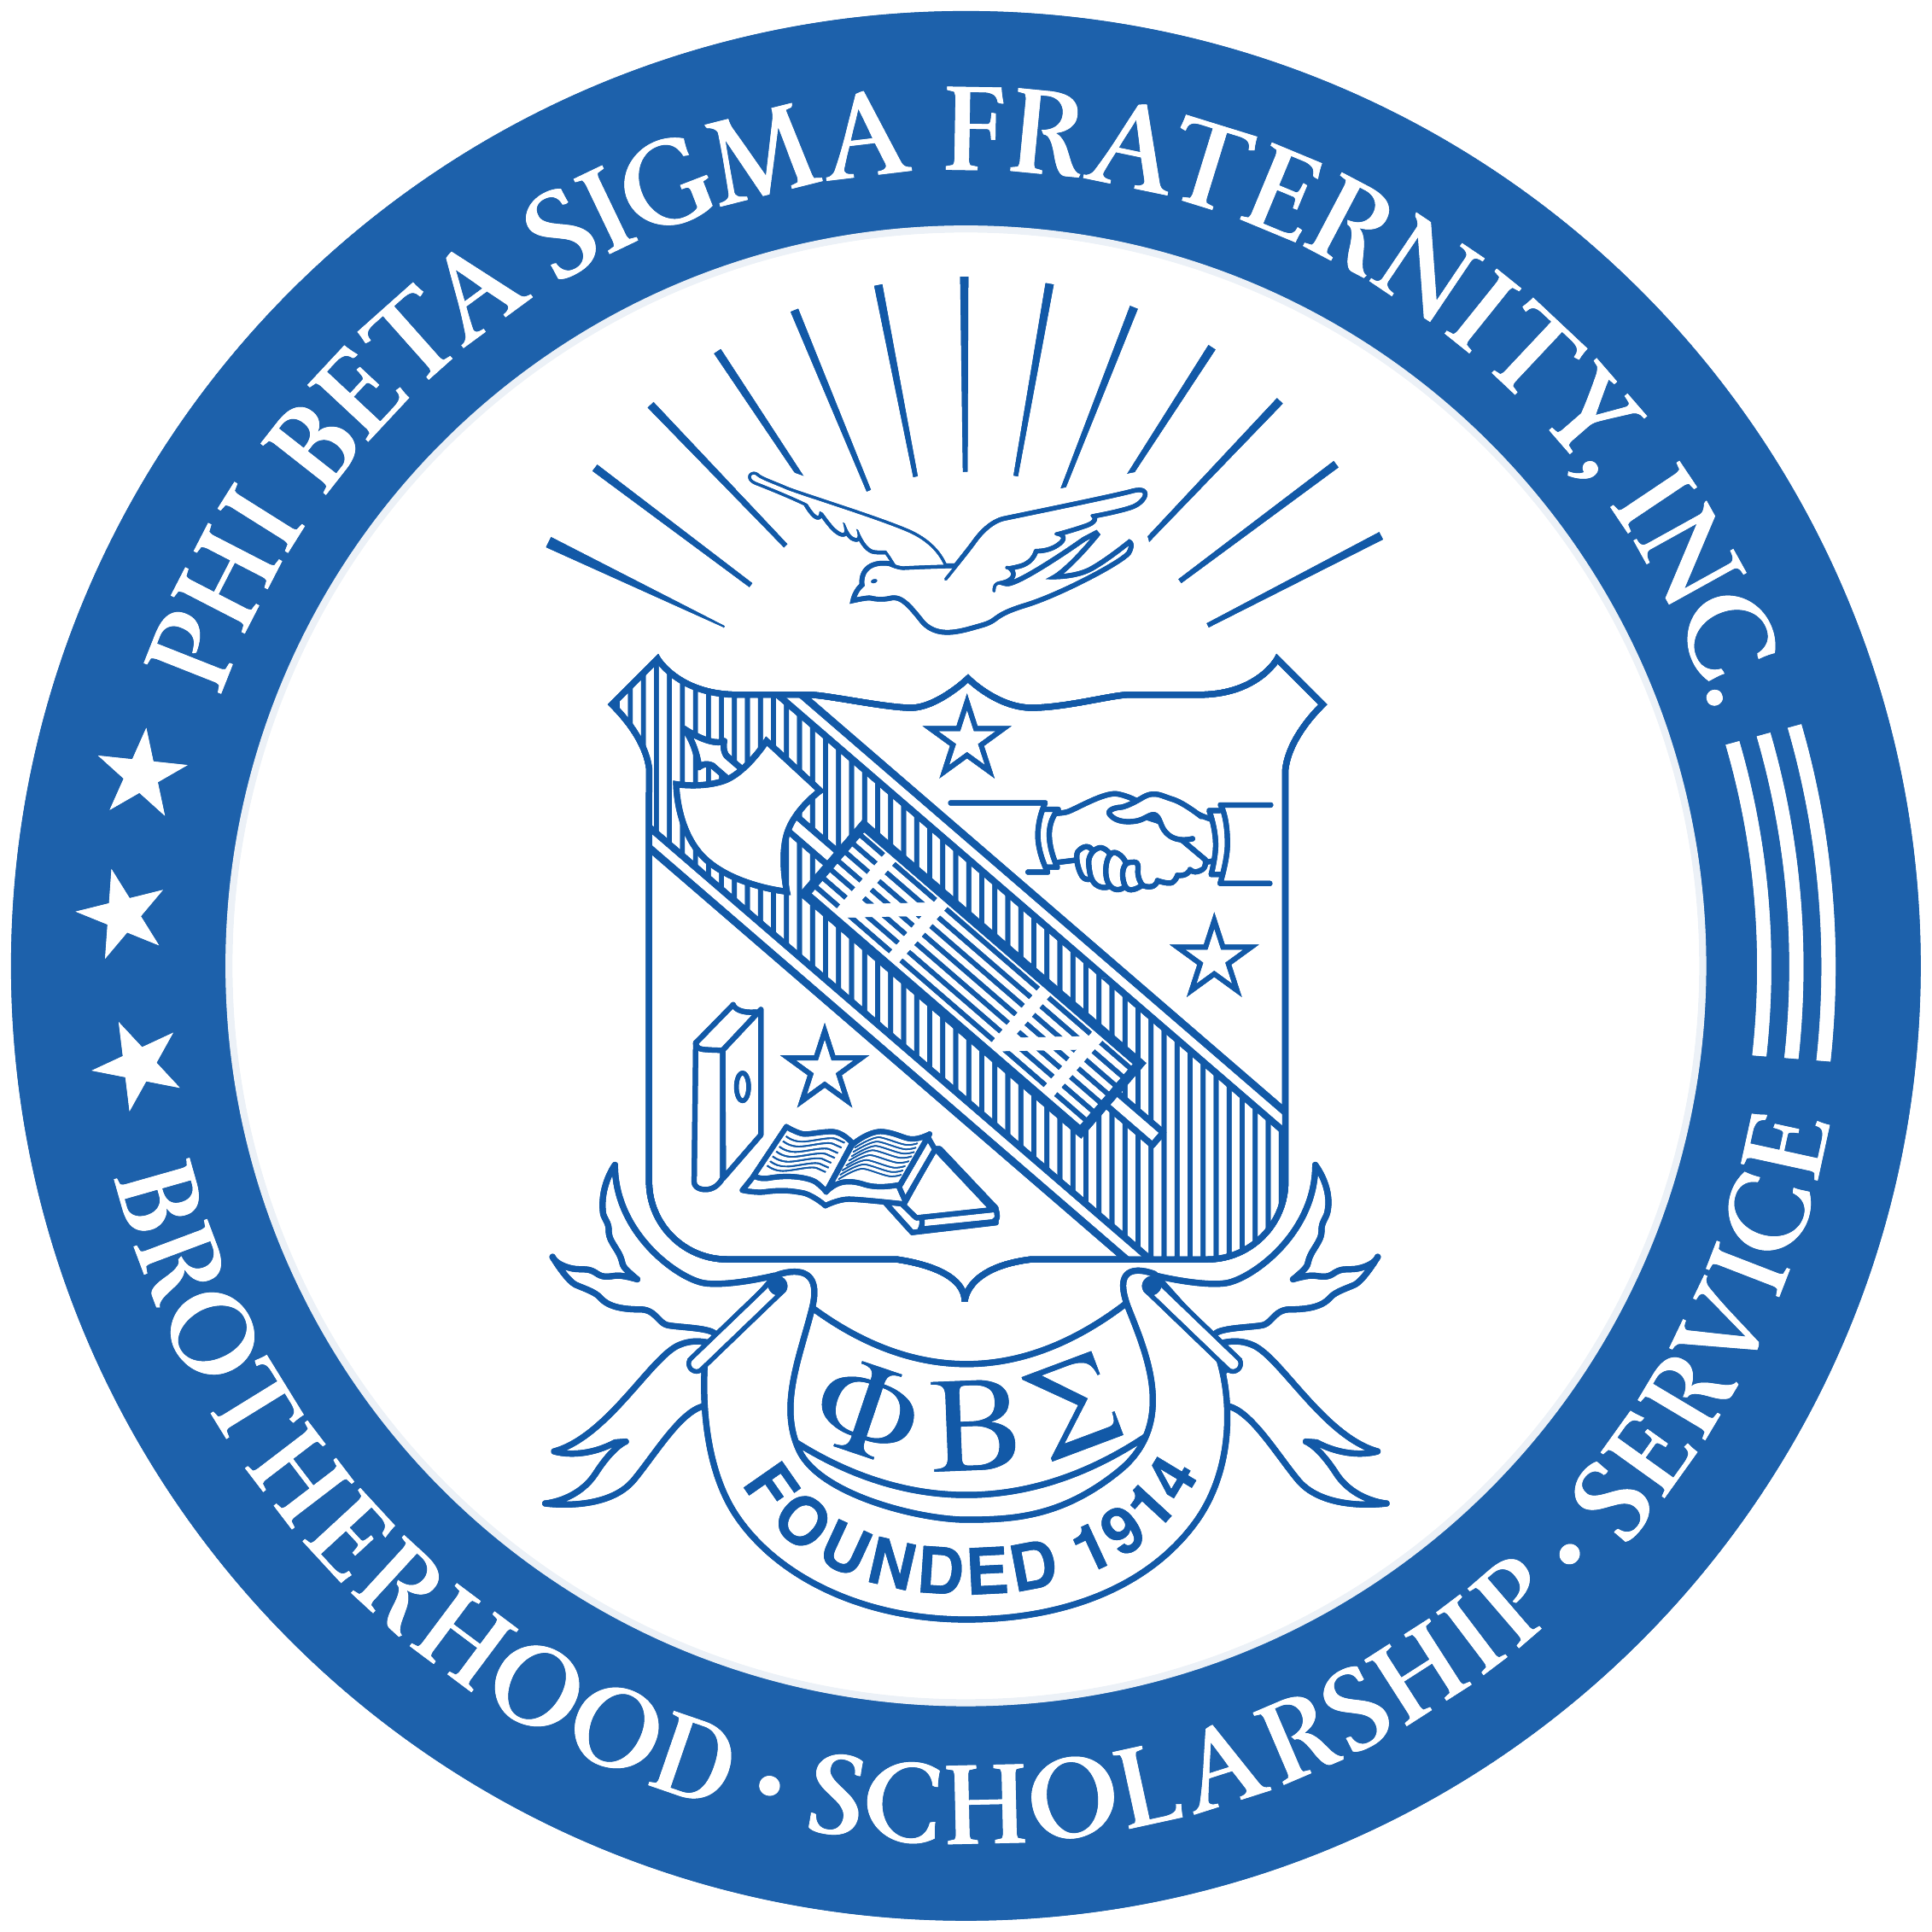 Beta sigma phi clipart 2015 picture transparent download Phi Beta Sigma Seal free image picture transparent download